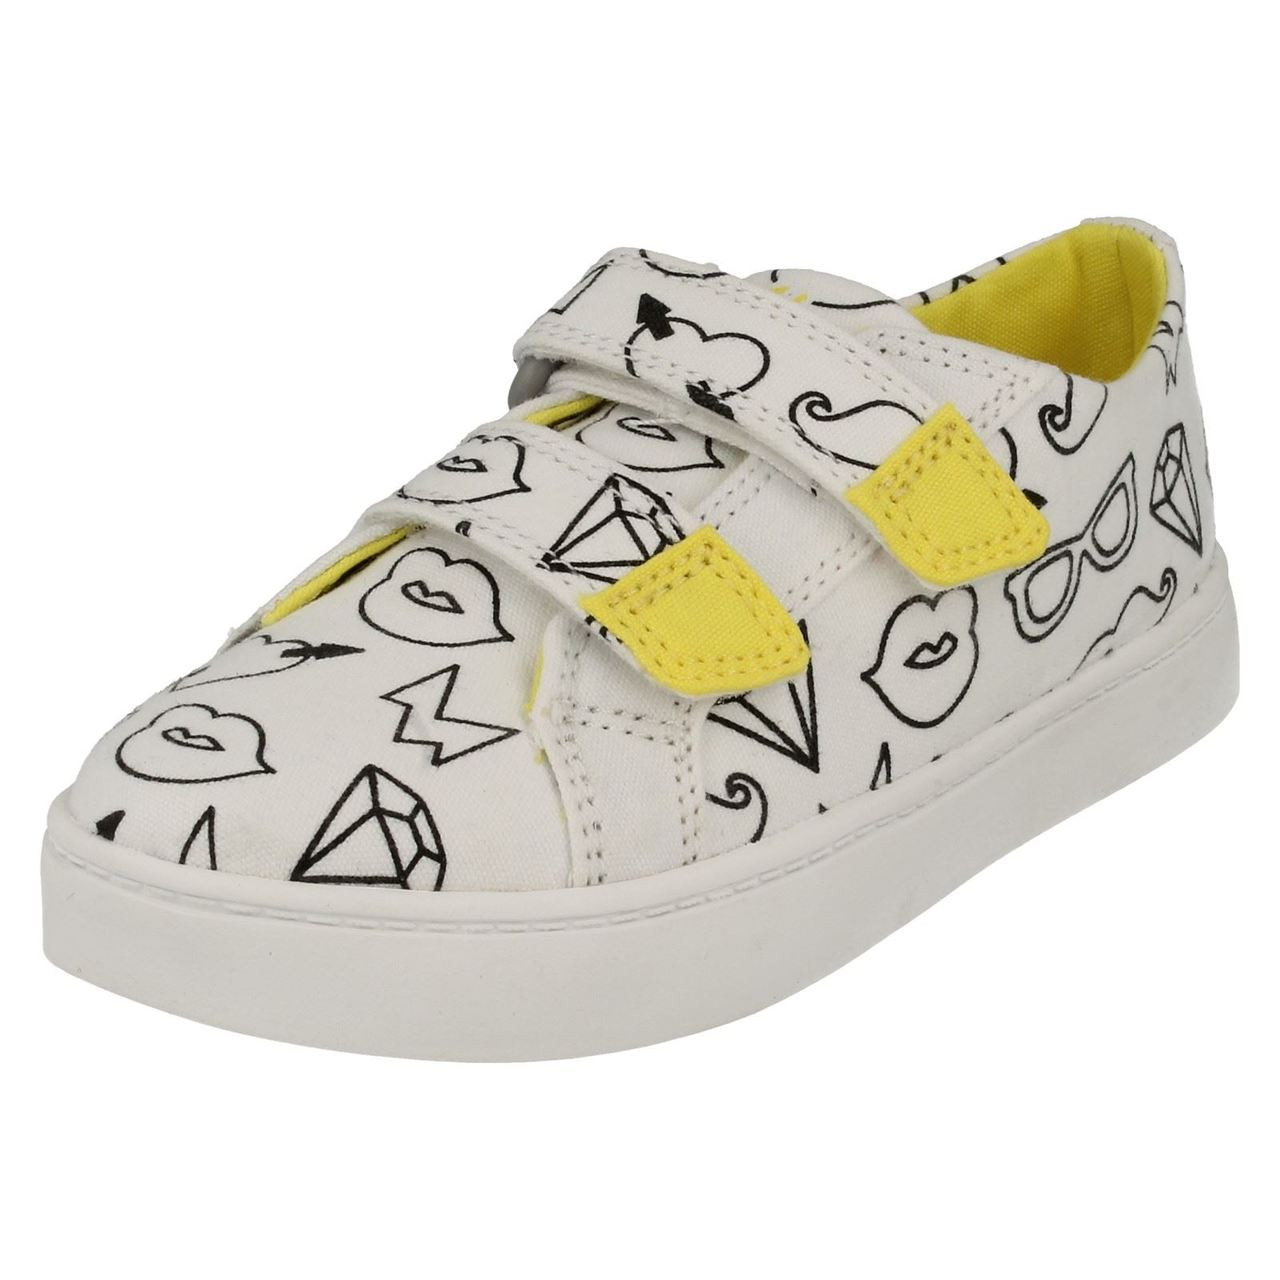 Girls Clarks Canvas Shoes Pattie Sue